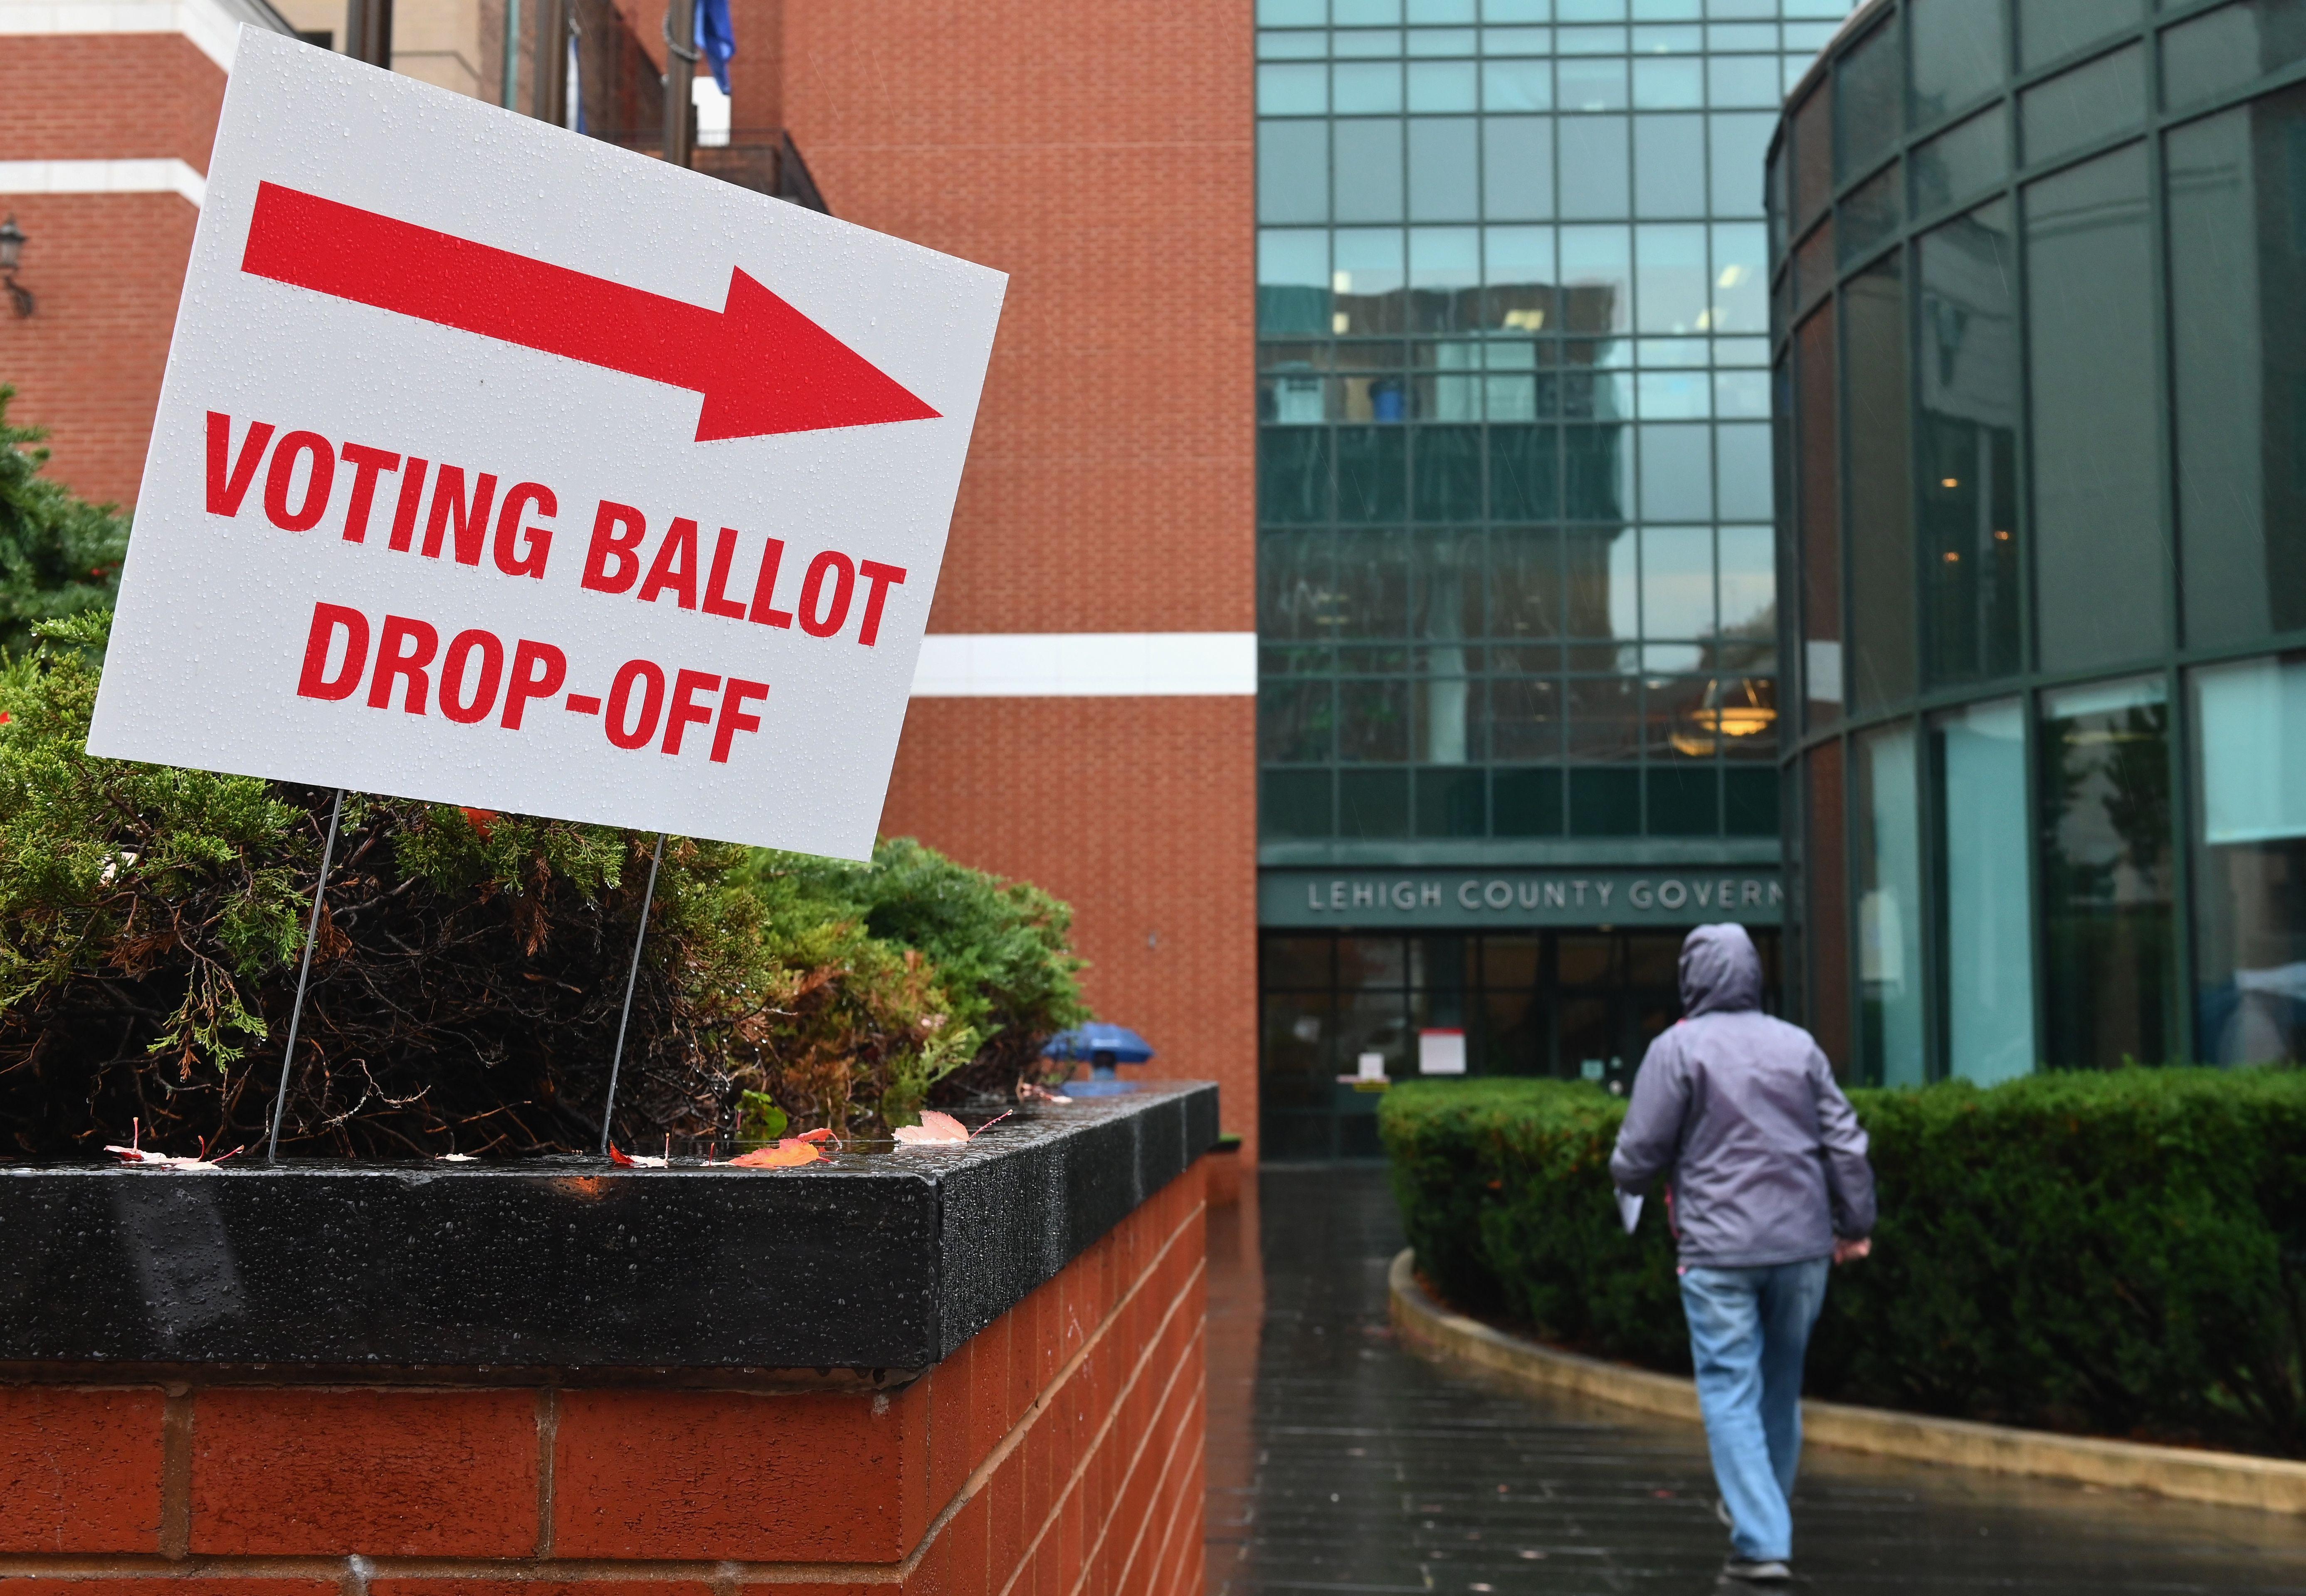 US-VOTE-DROPOFF